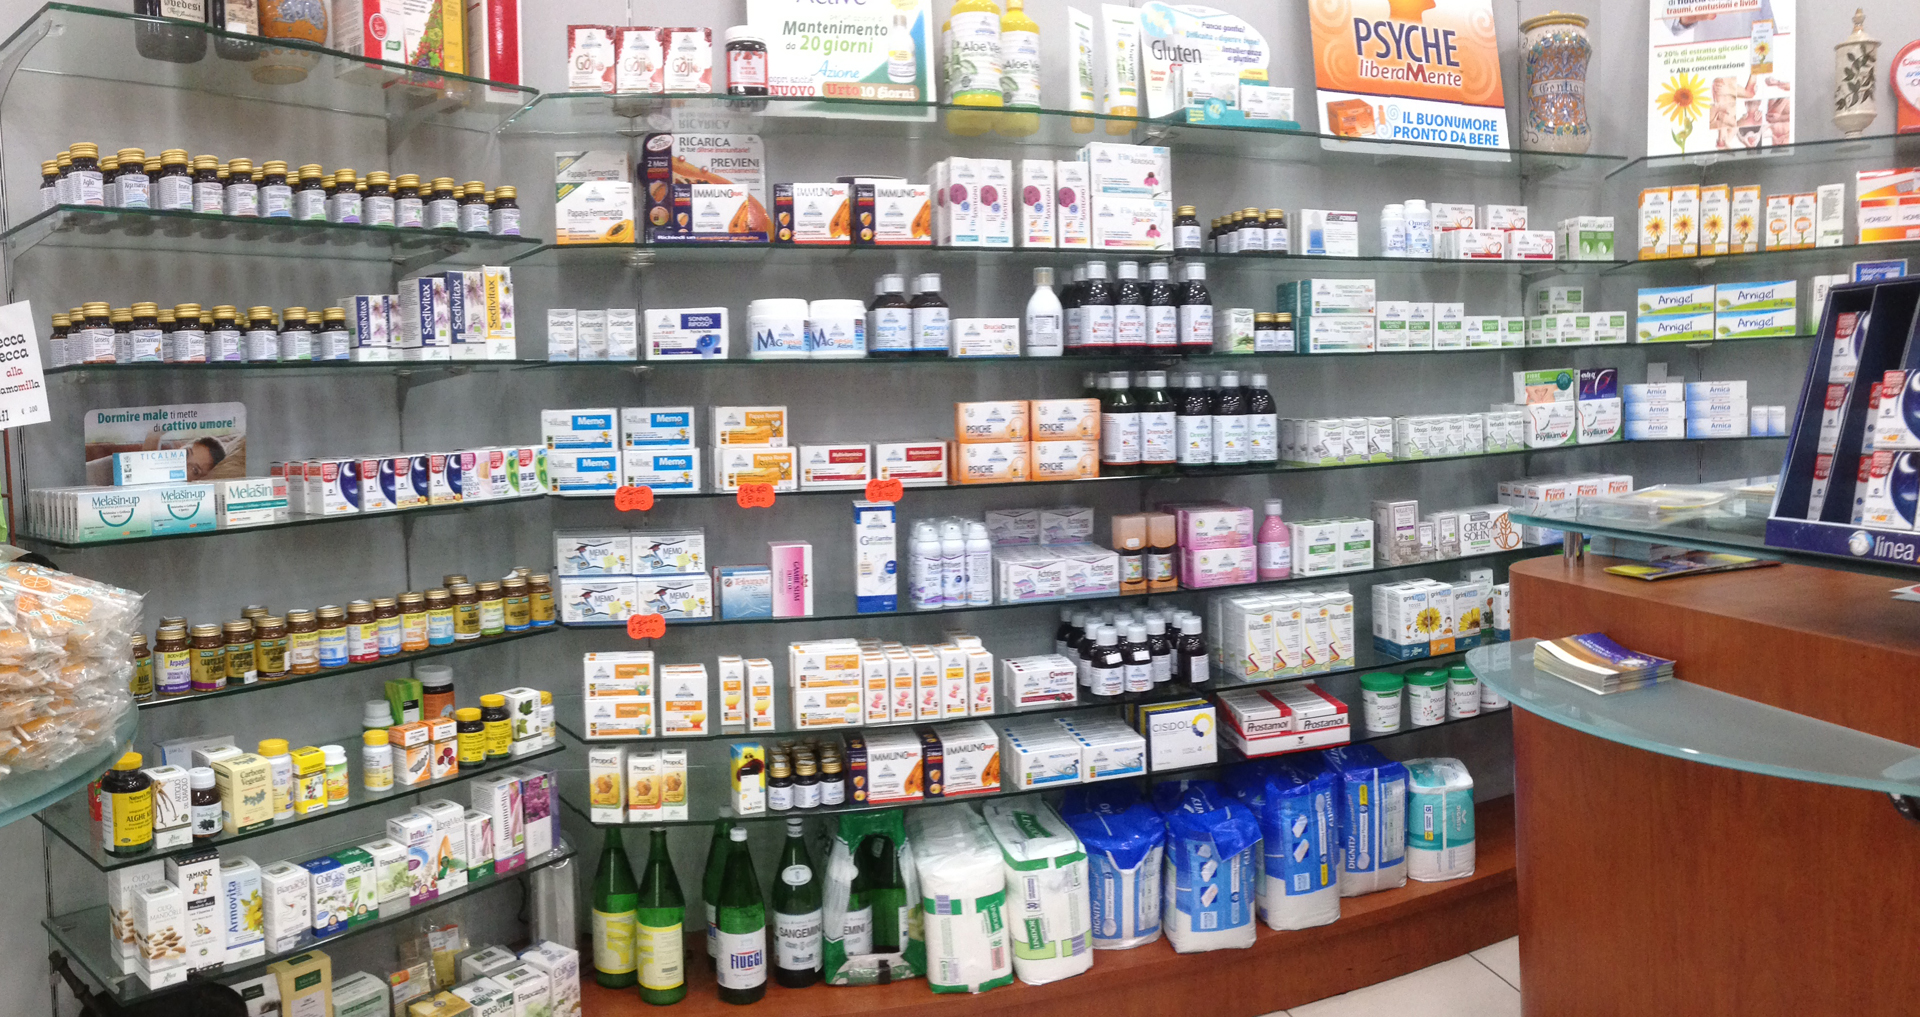 medicina_naturale2